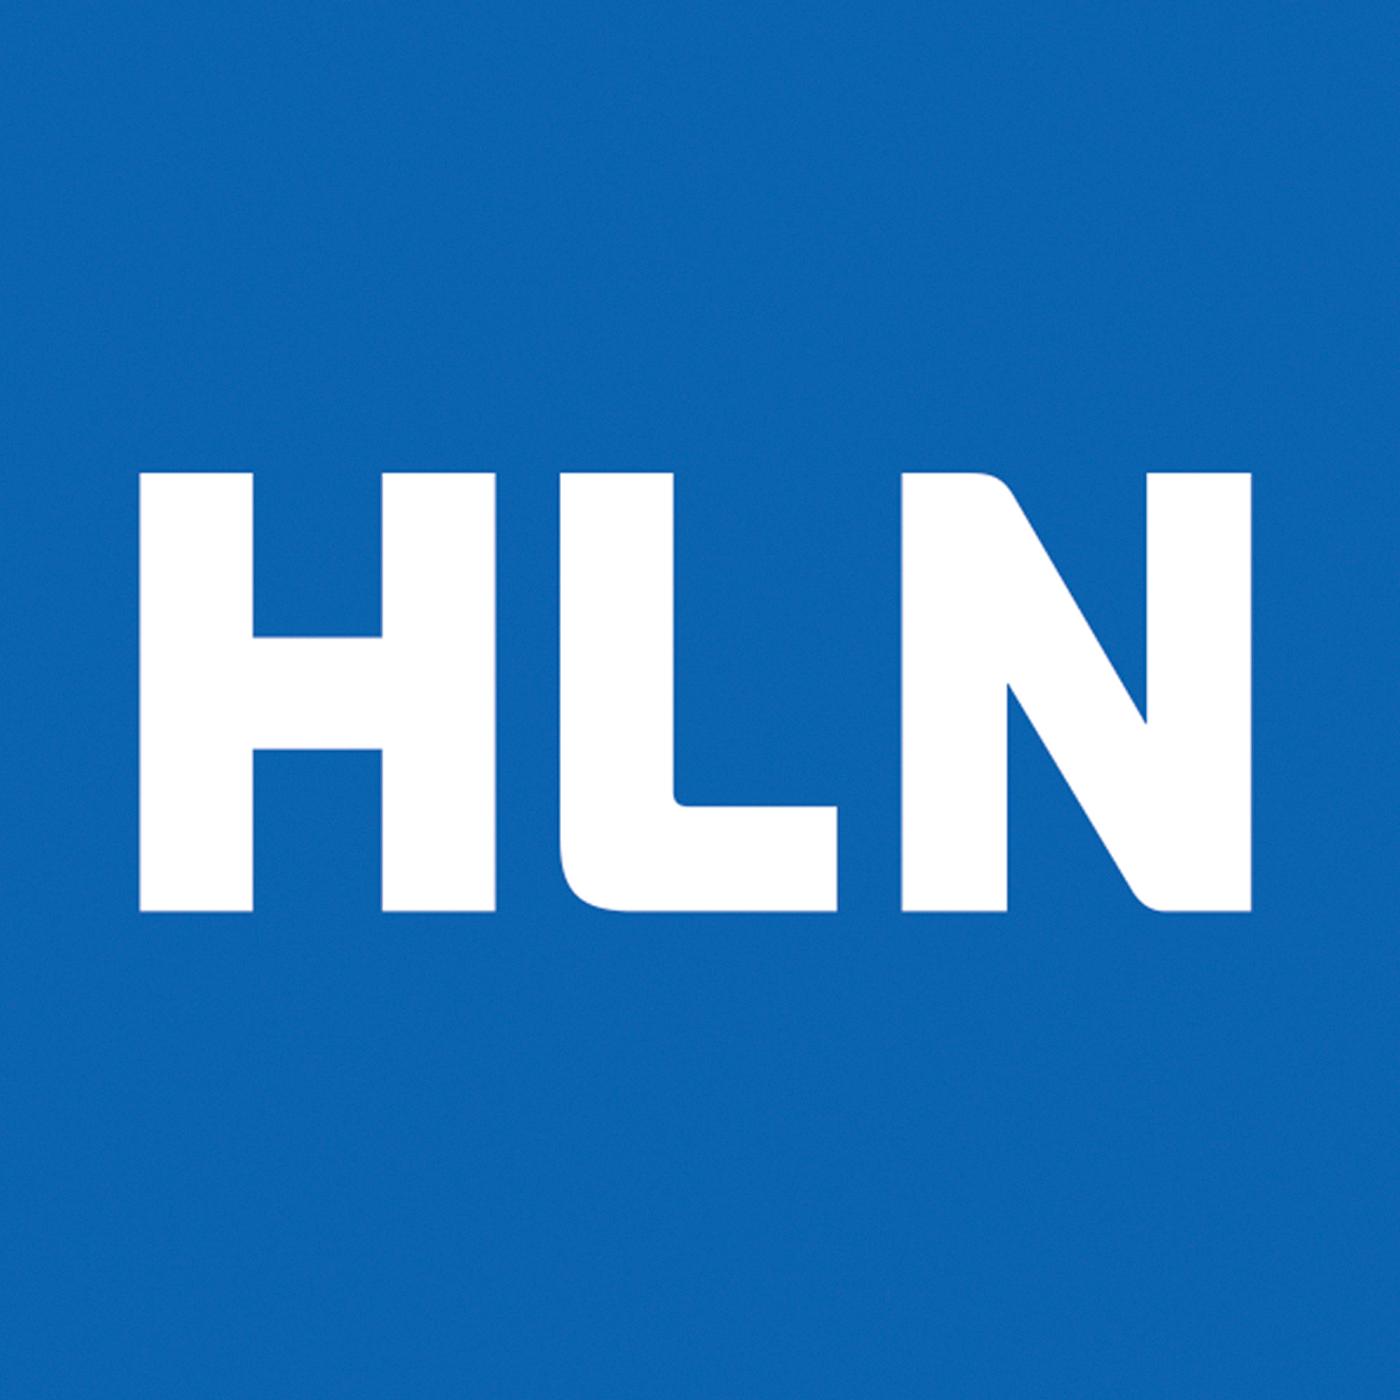 CNN HLN logo